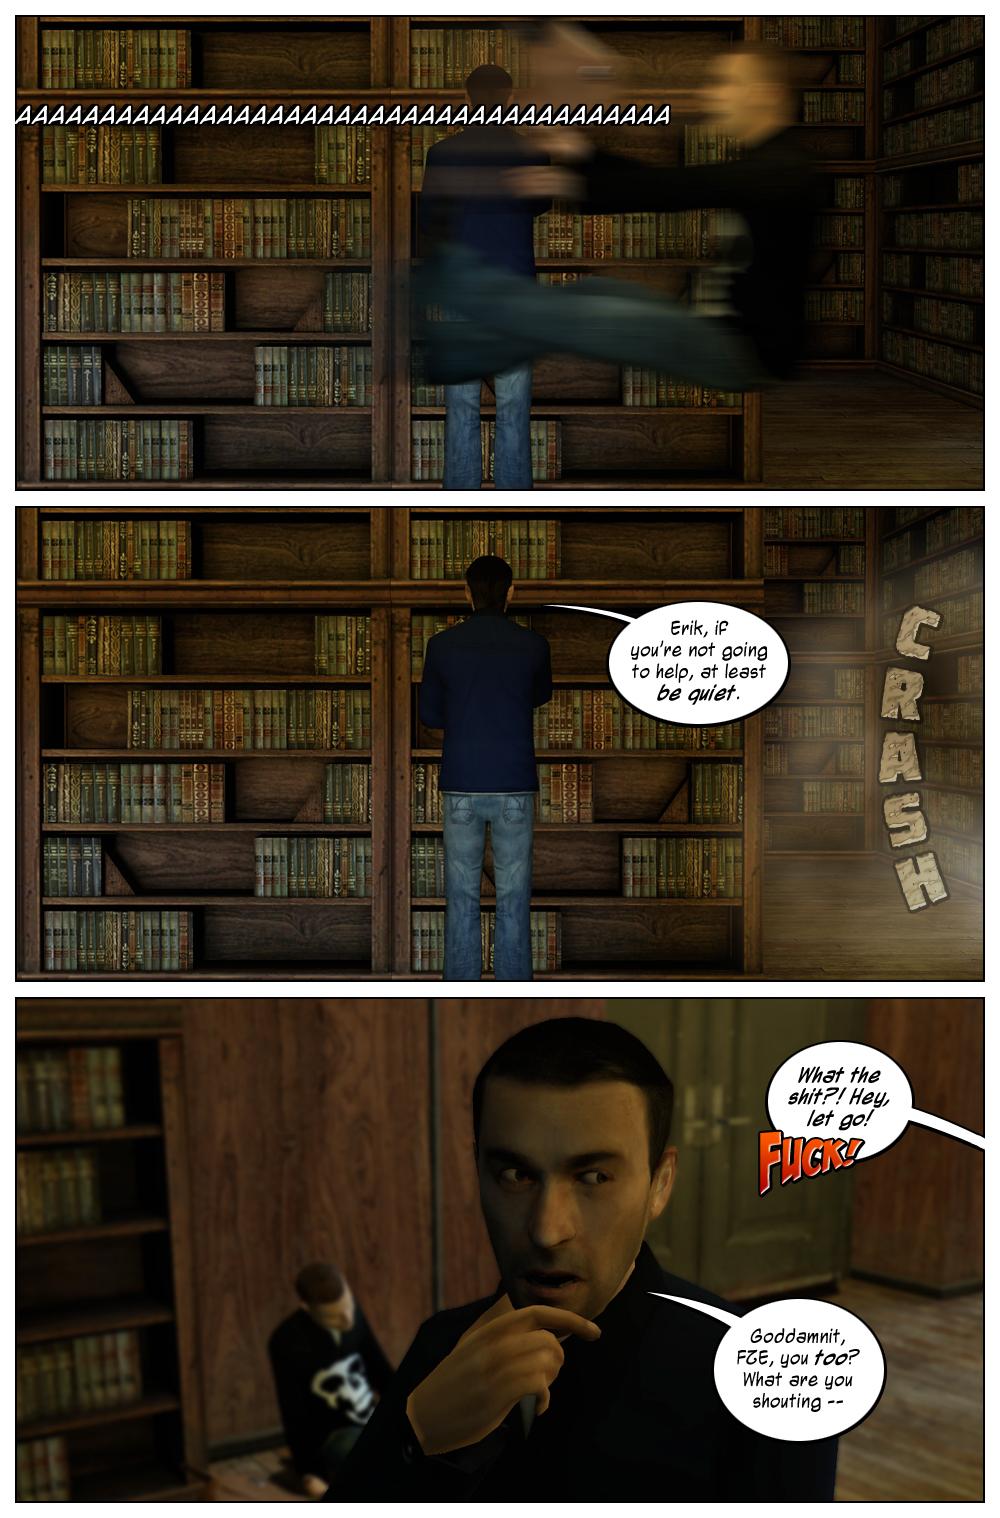 Mythic Comics #2 Page 14